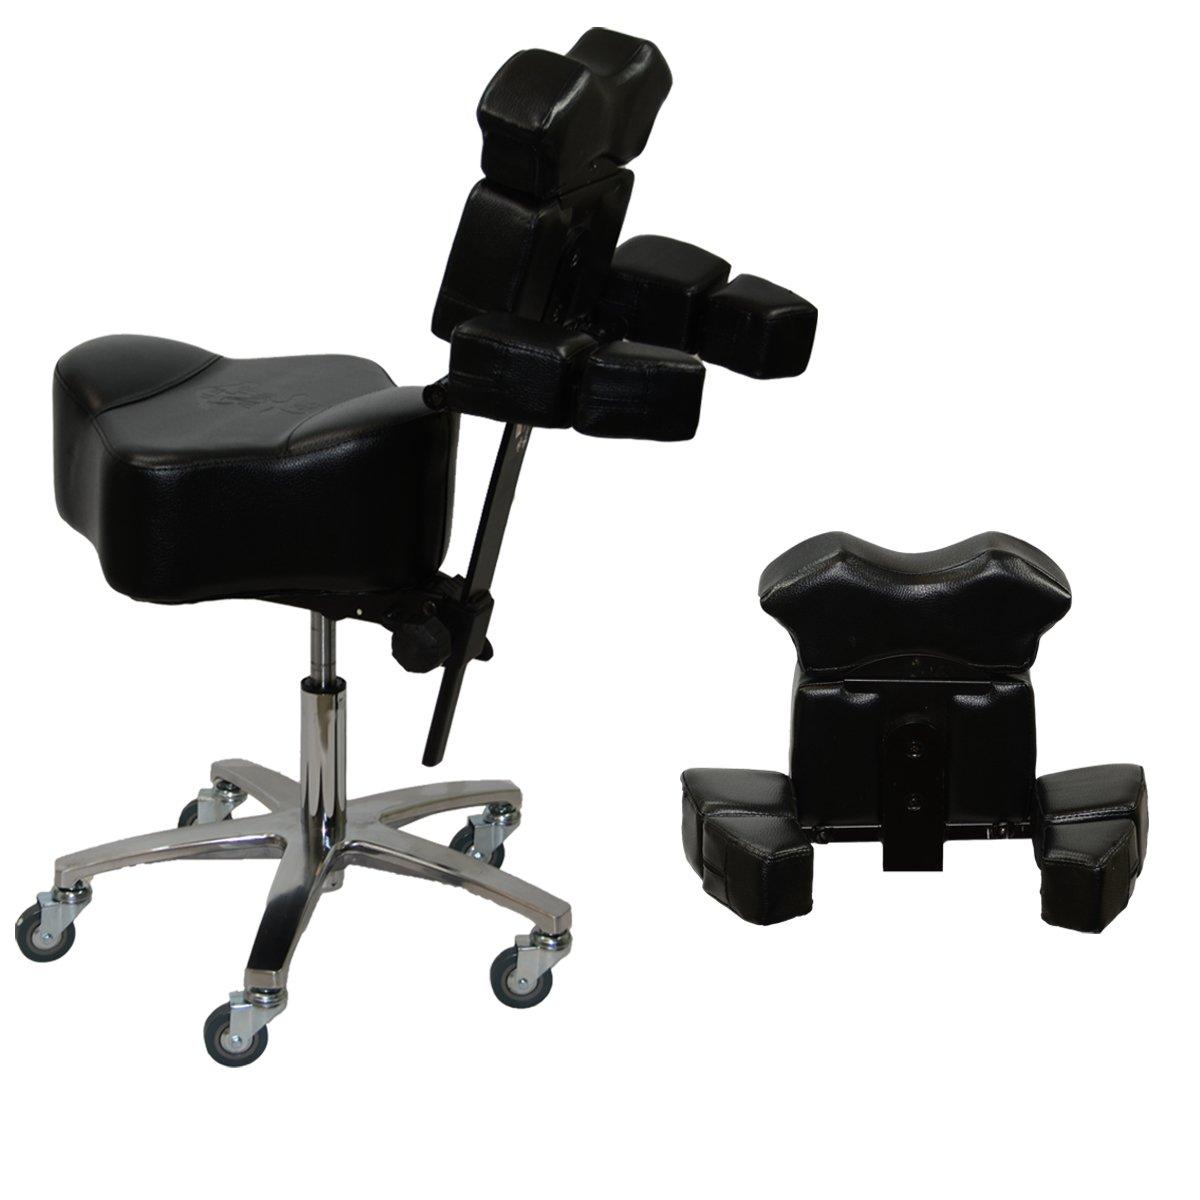 amazon com brand new inkbed patented adjustable ergonomic chair